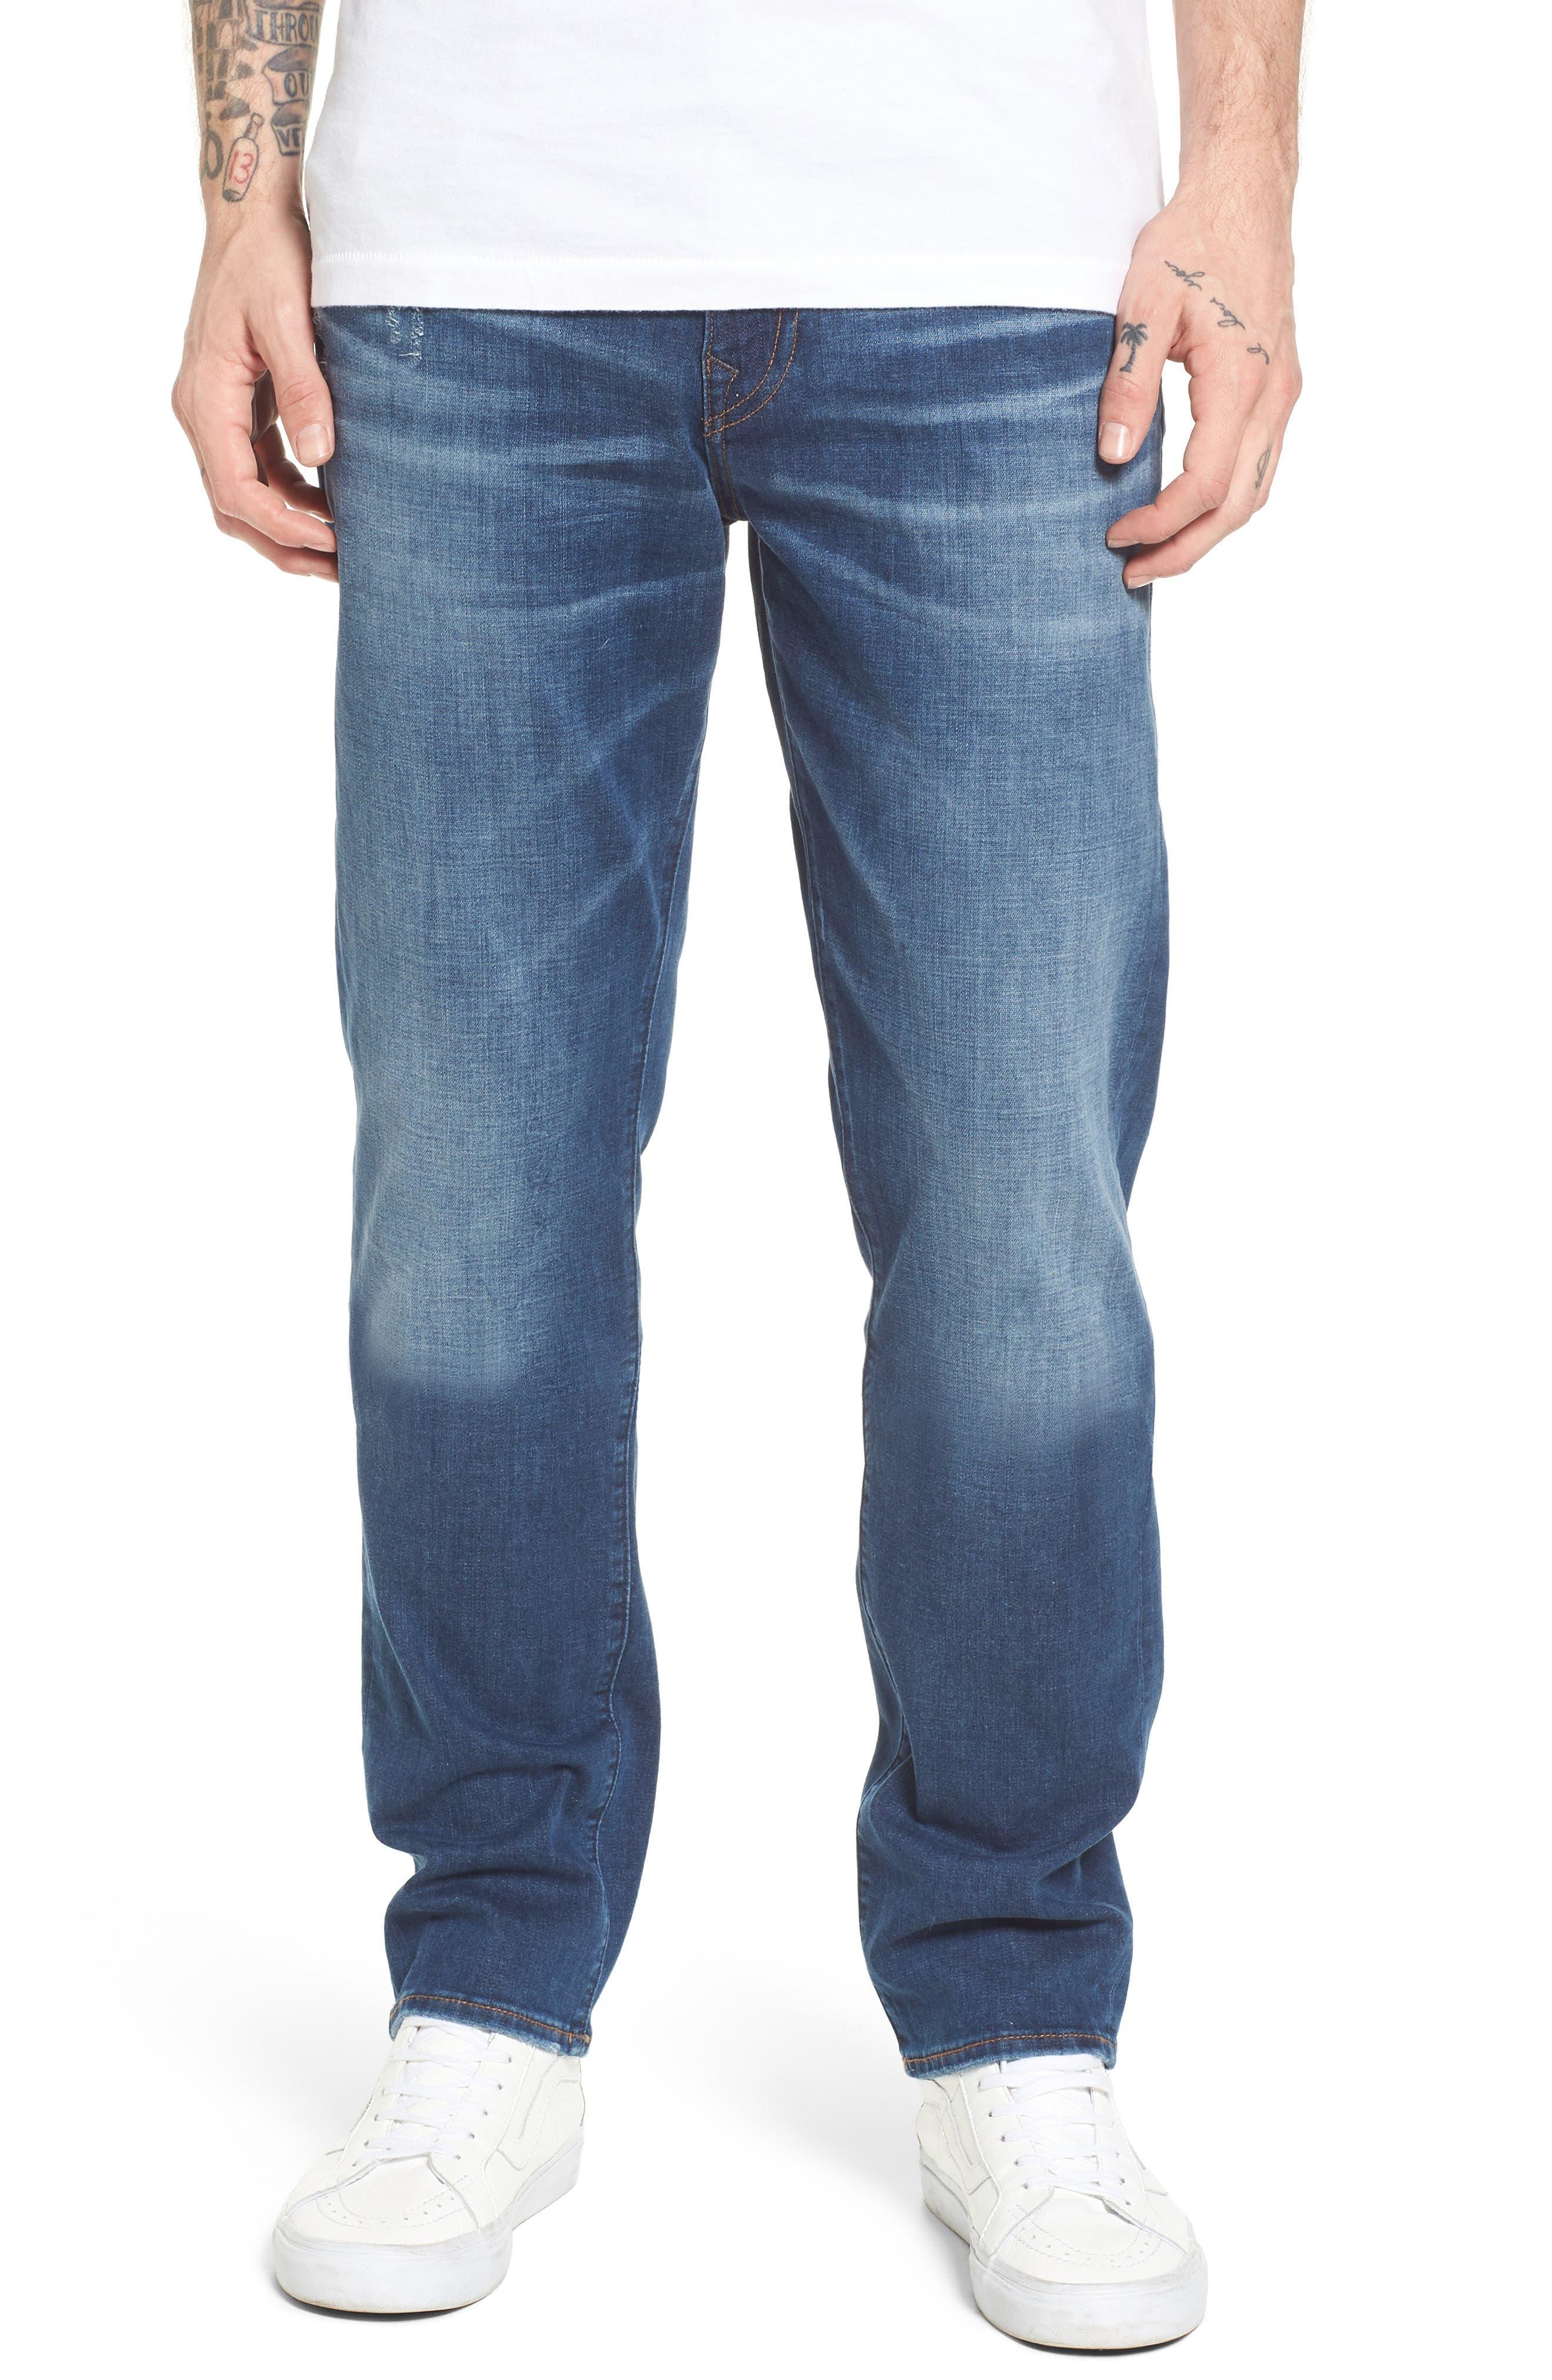 Geno Straight Leg Jeans,                         Main,                         color,